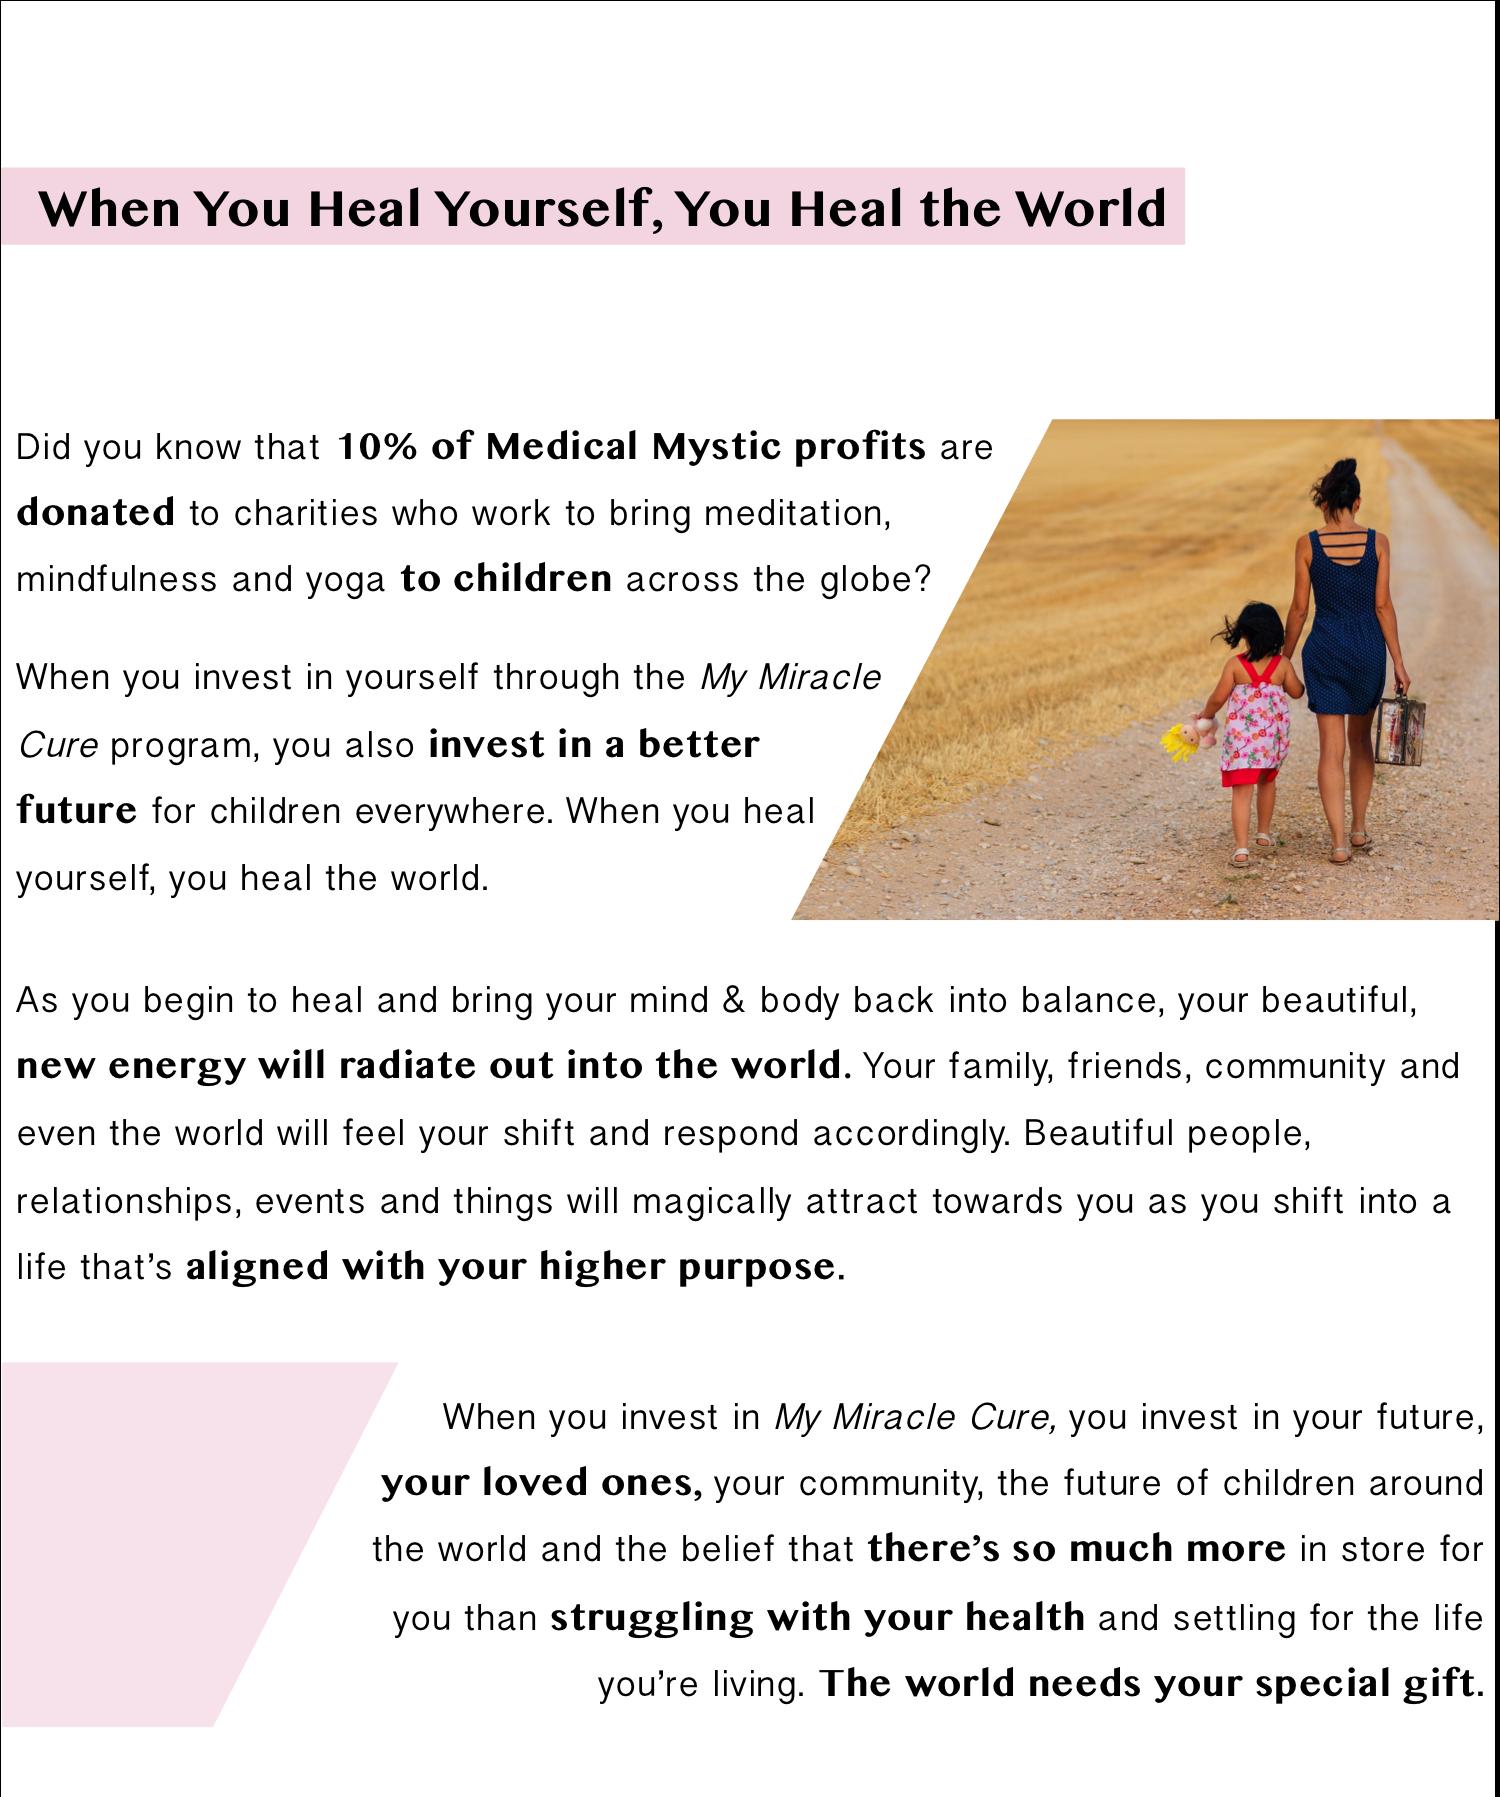 Heal Yourself, Heal the World